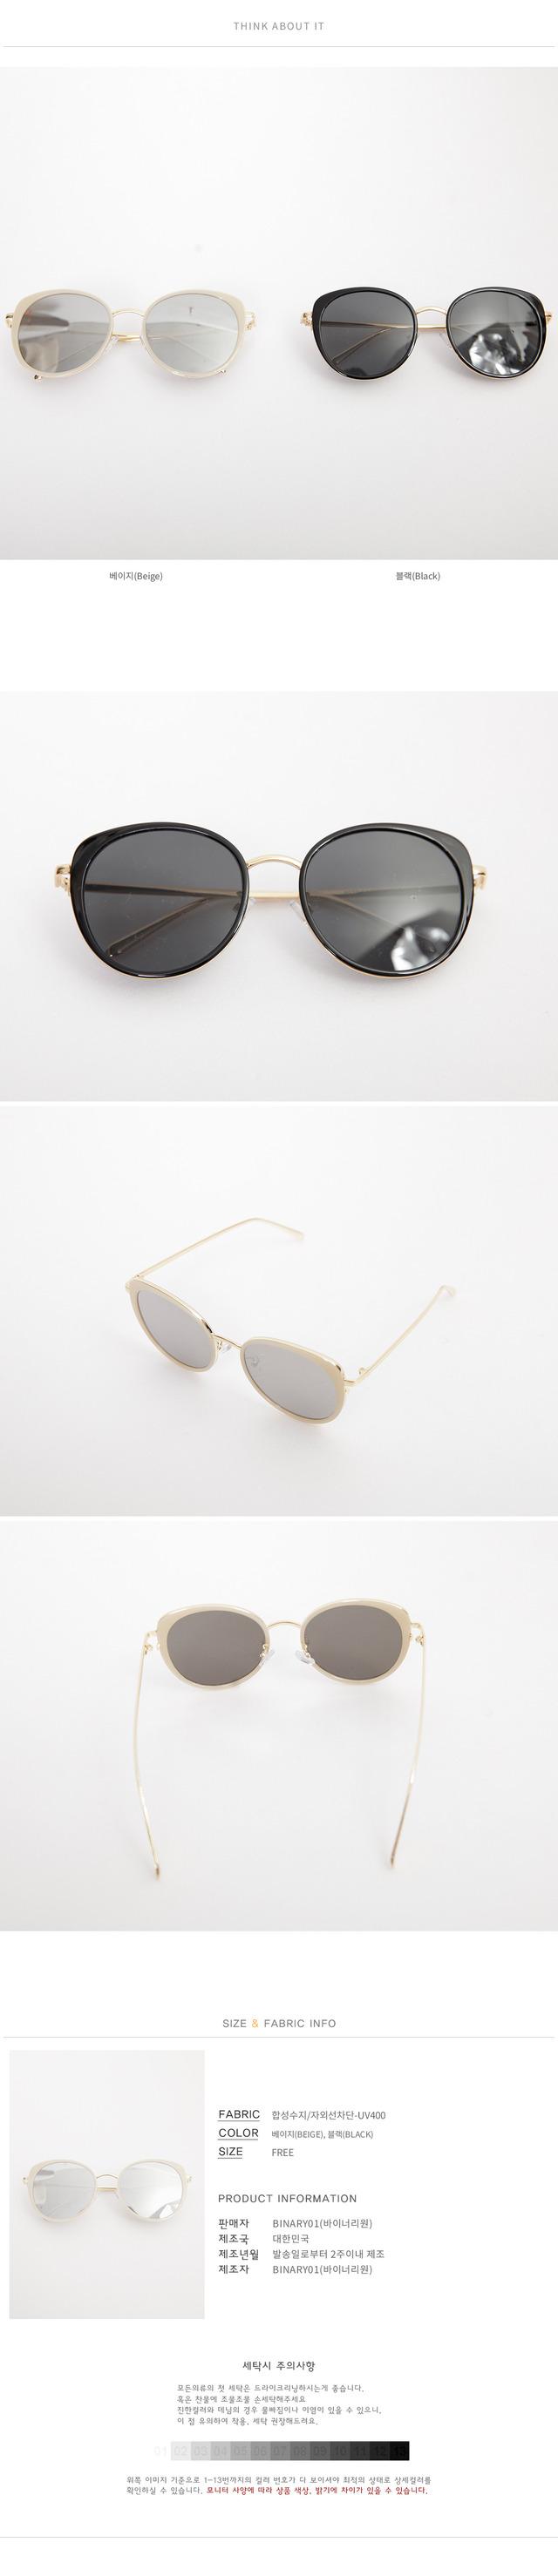 Mirror Tinted Eica sunglasses